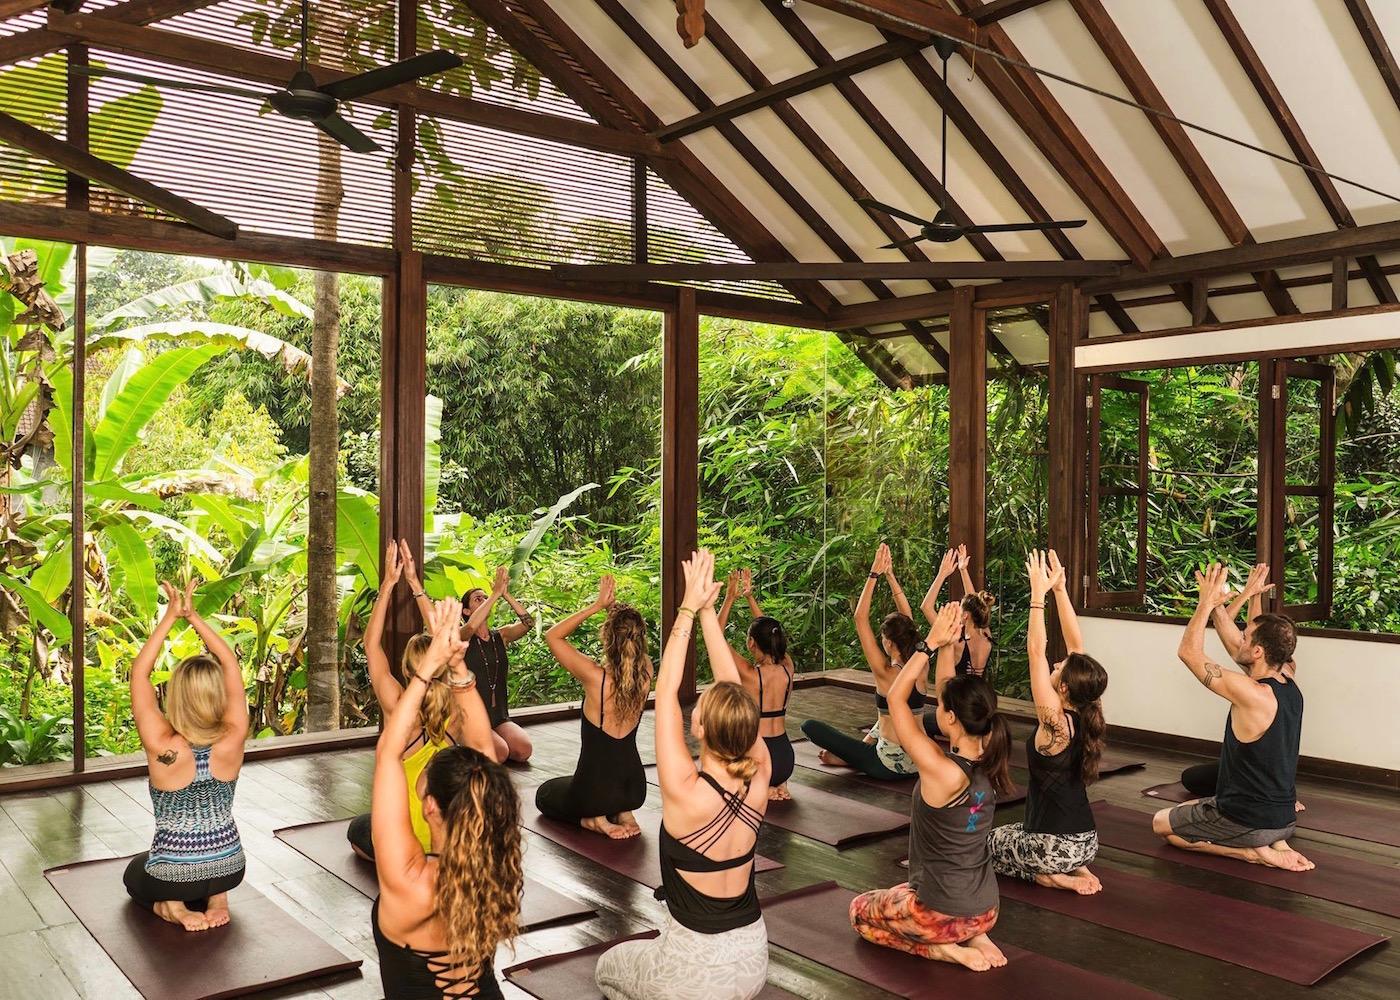 Yogis at Radiantly Alive in Ubud, Bali, Indonesia